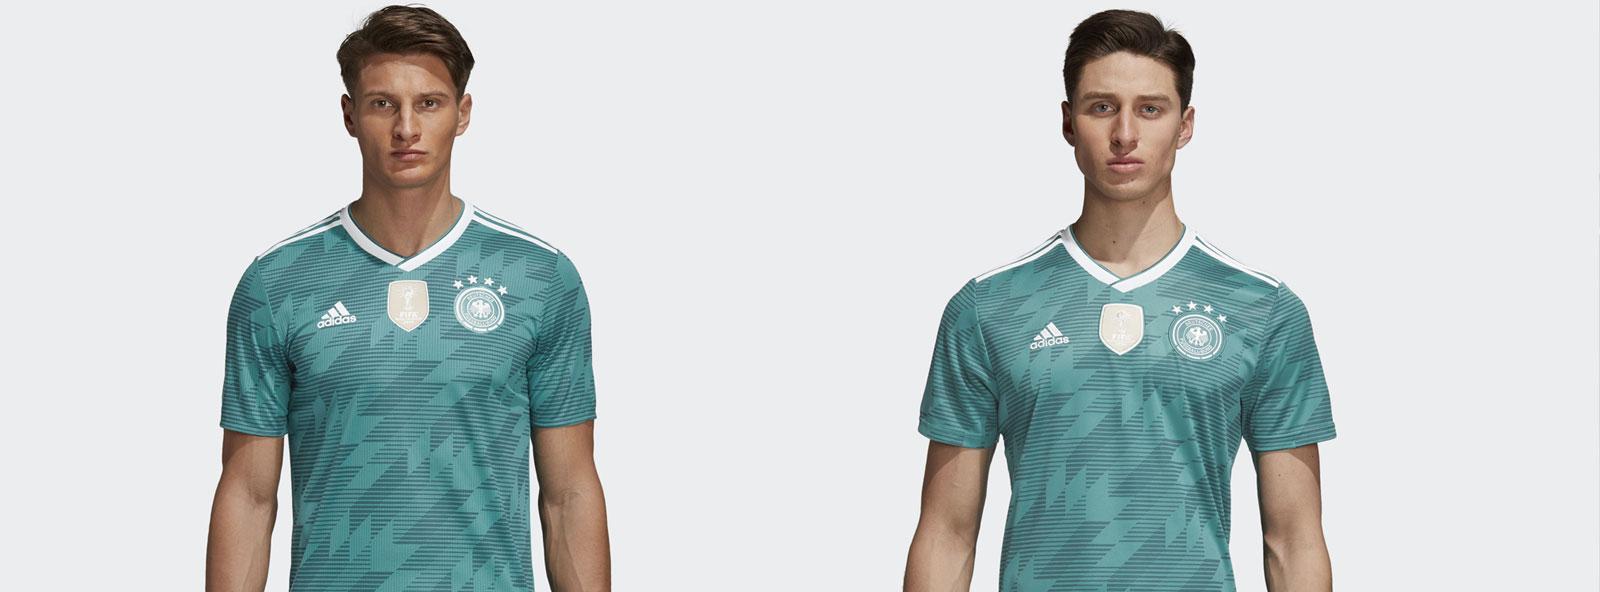 deutschland trikot auswärts 2018 kaufen